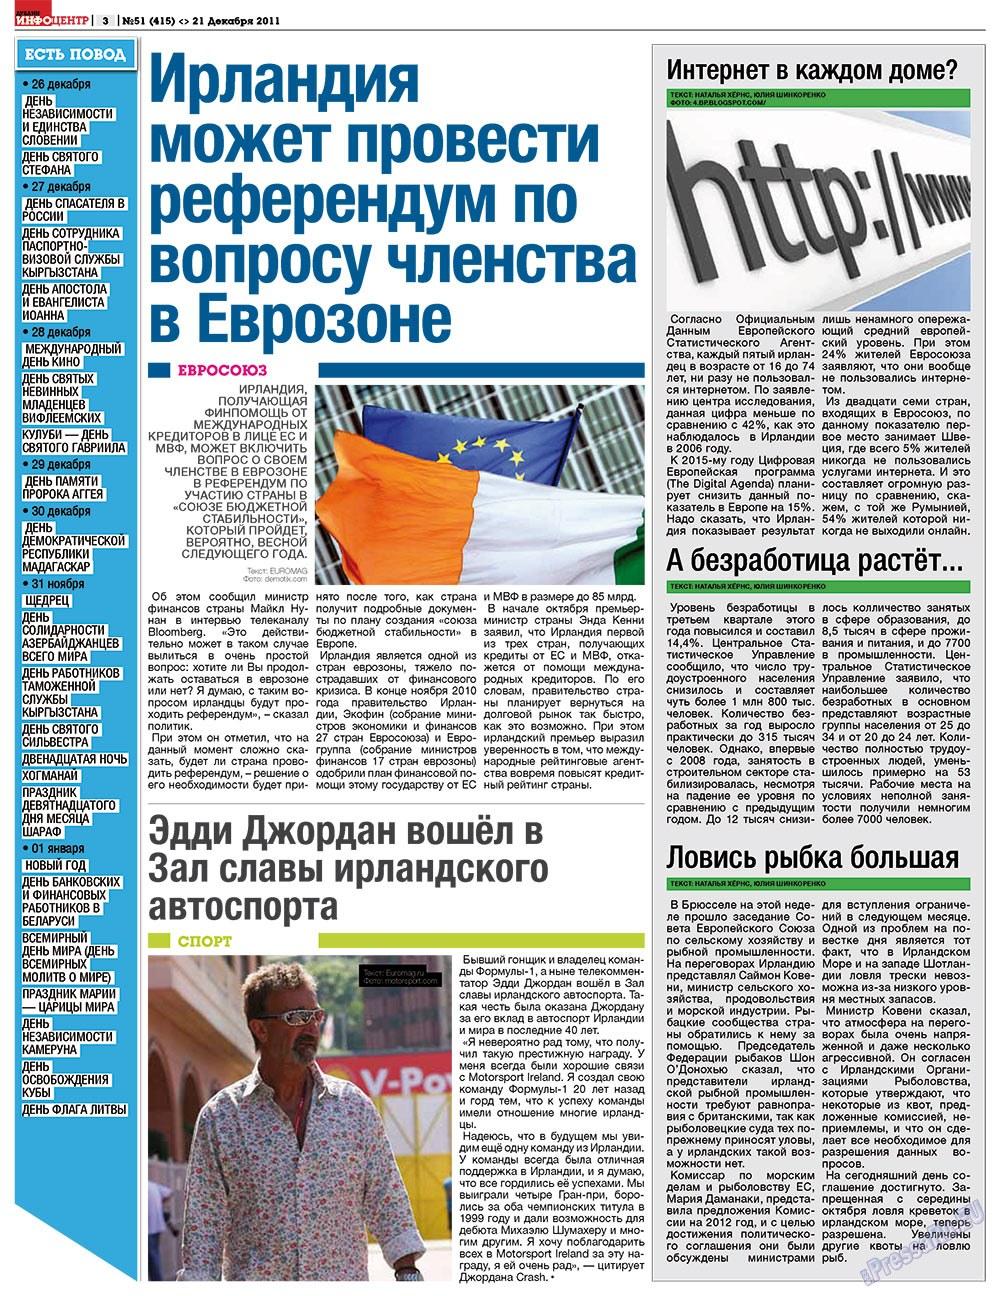 Дублин инфоцентр (газета). 2011 год, номер 51, стр. 3